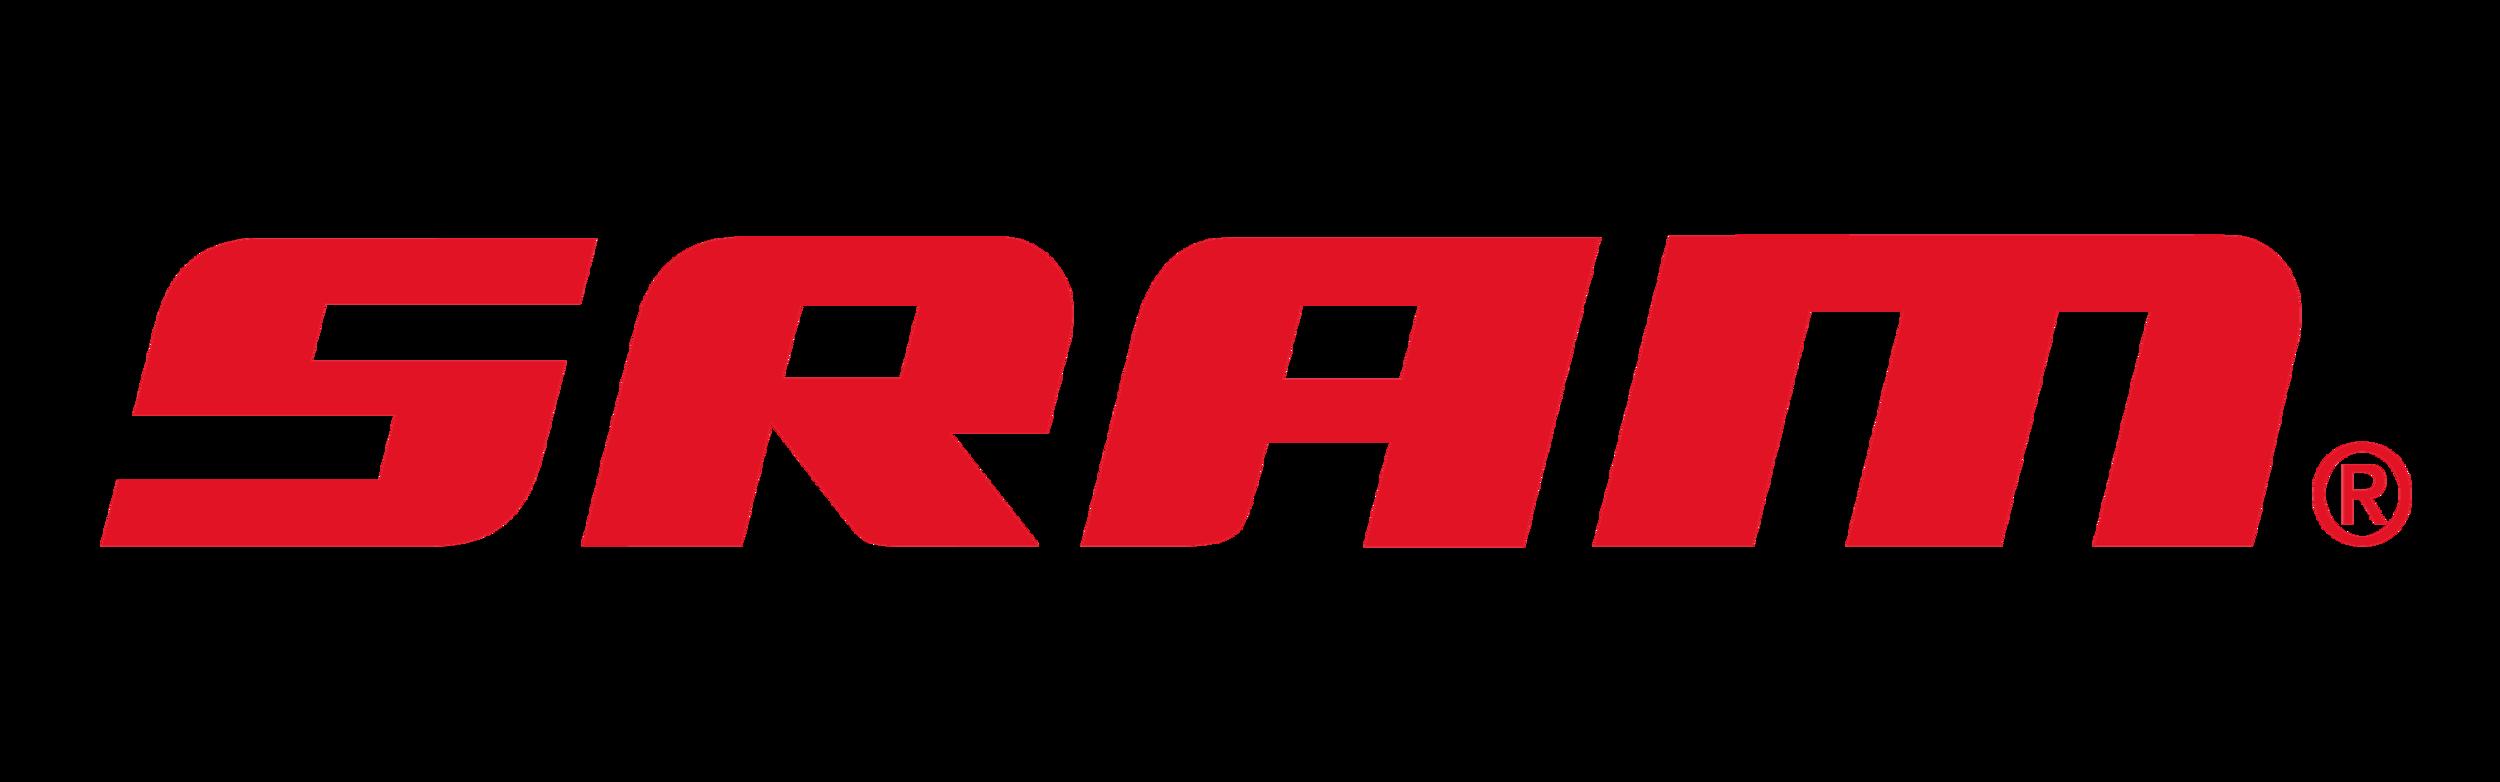 Drive Train + Brakes